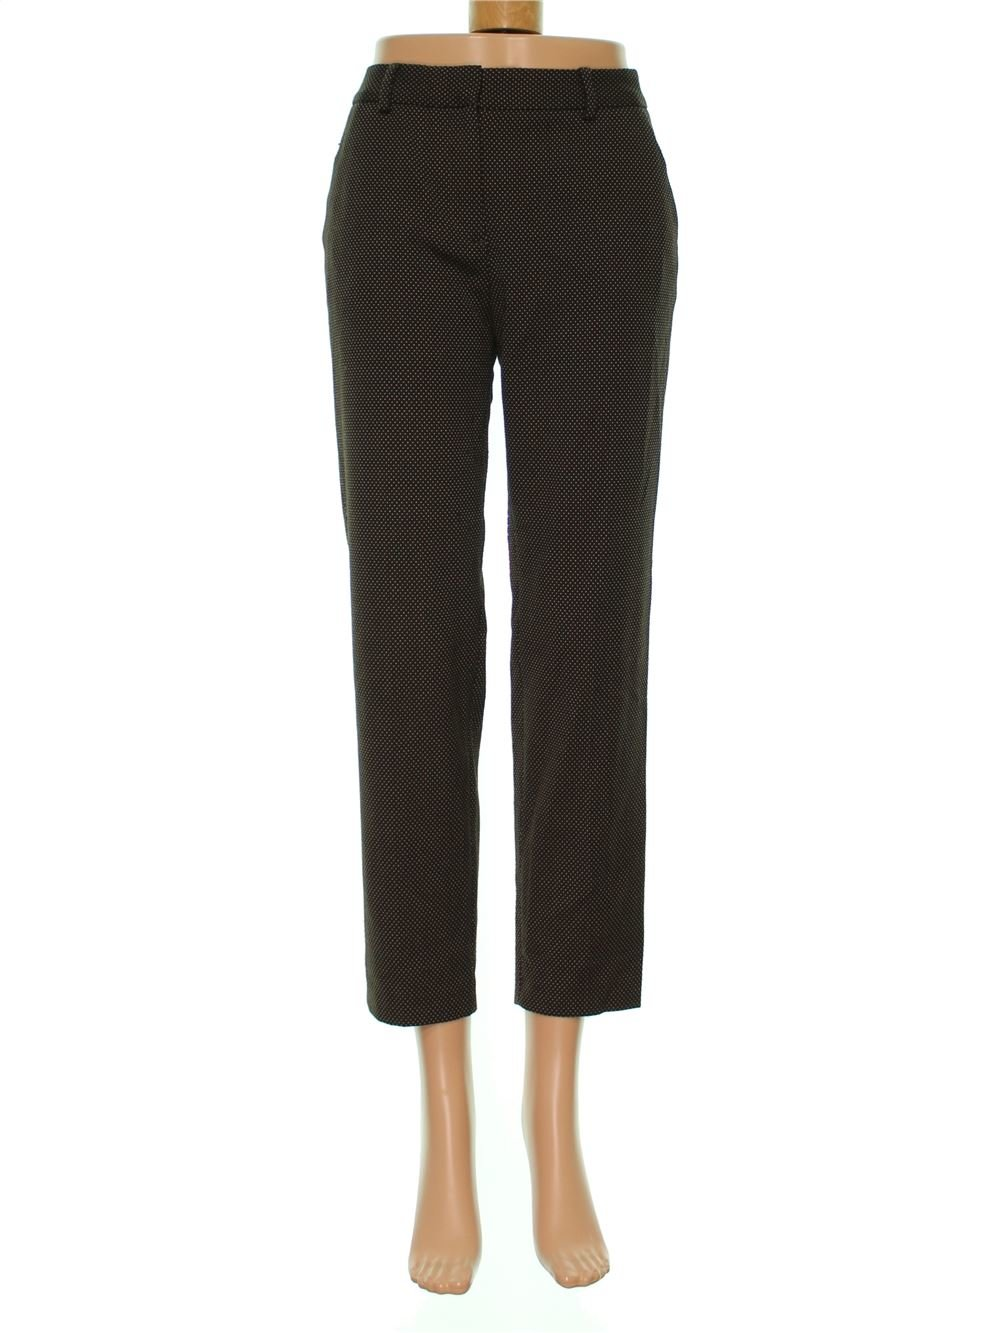 Pantalon Zara €1290460 38m T1Pas Cher13 Femme 99 sxhrtQCBd